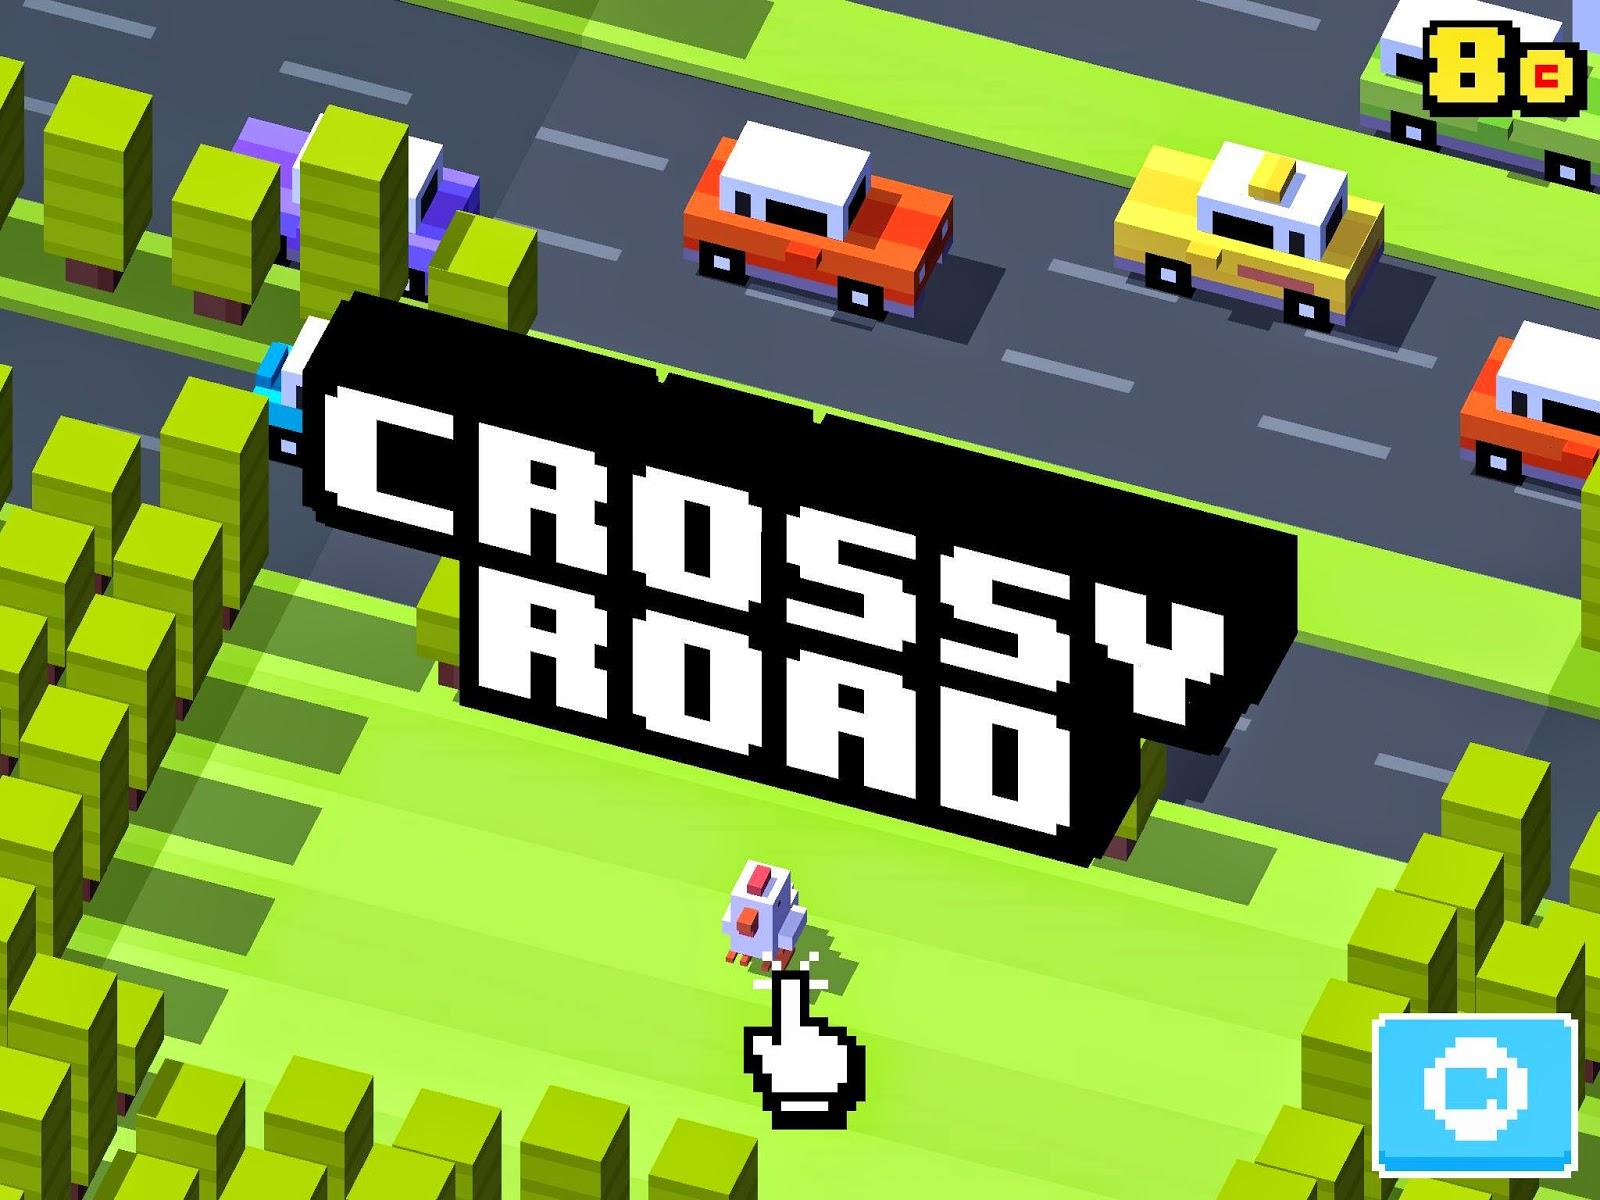 لعبه Crossy Road